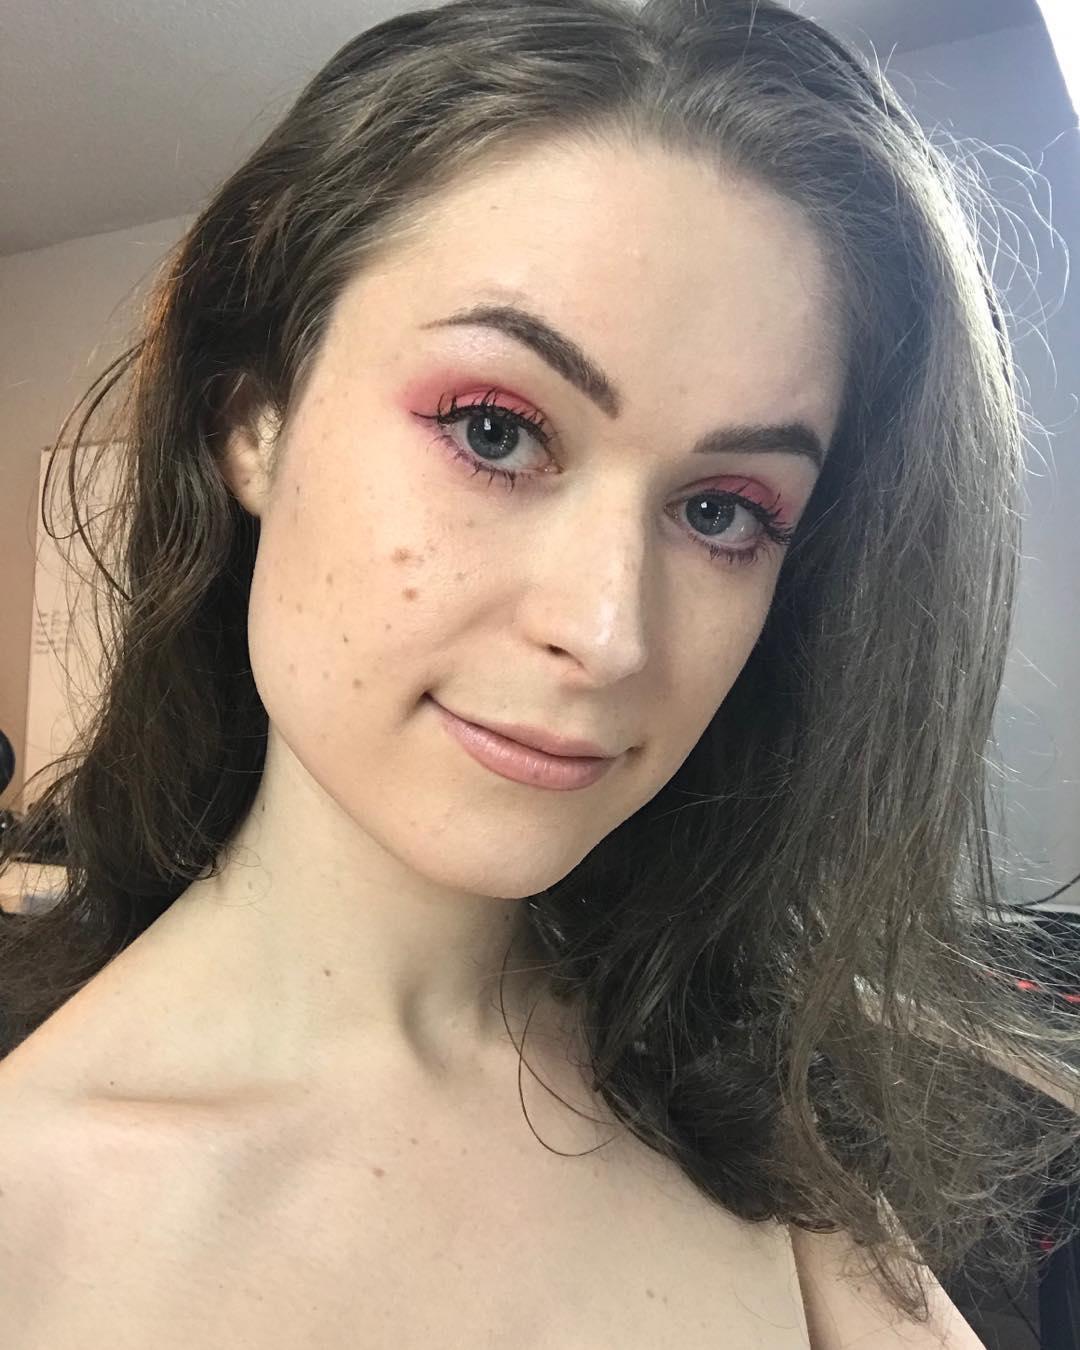 AnaNomie testing makeup